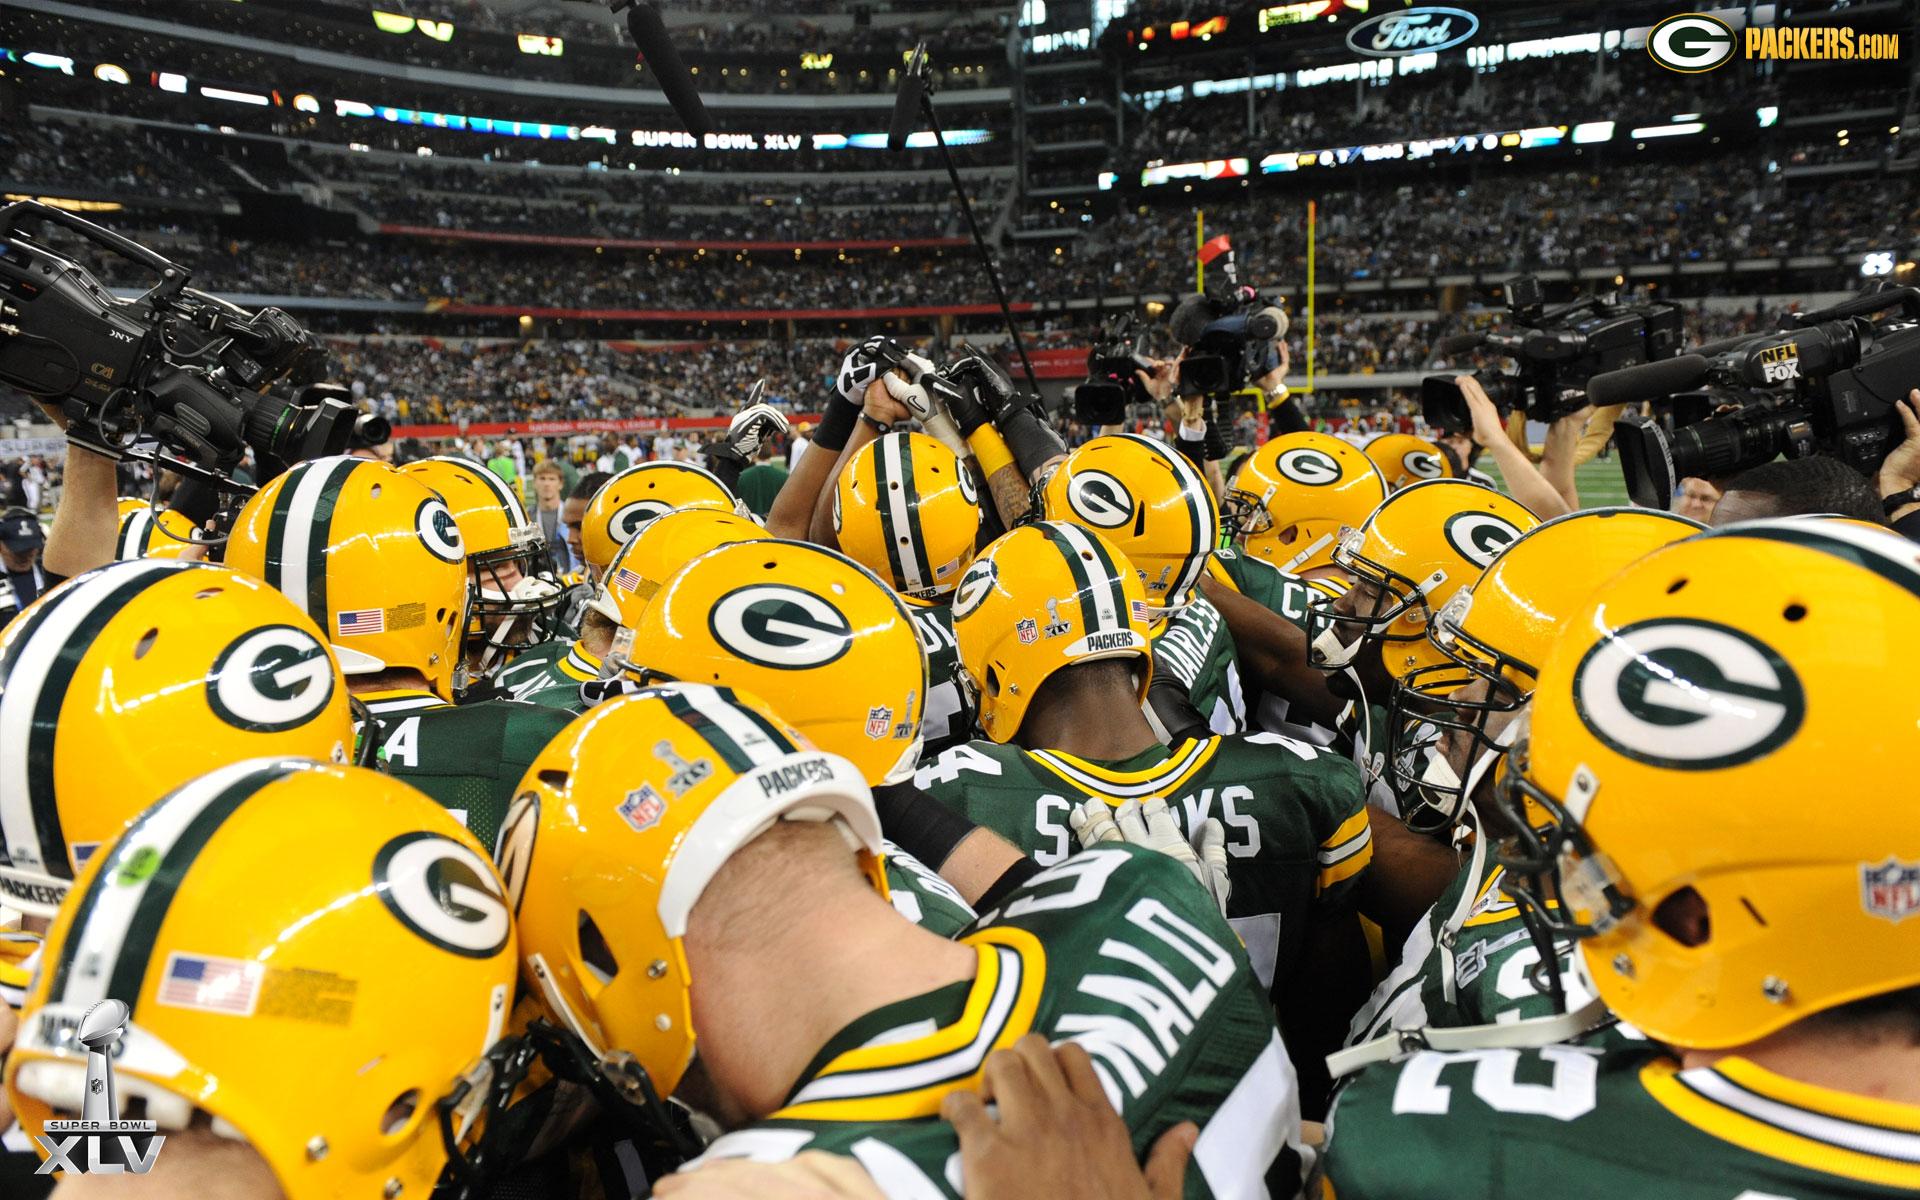 Green Bay Packers Aufstellung